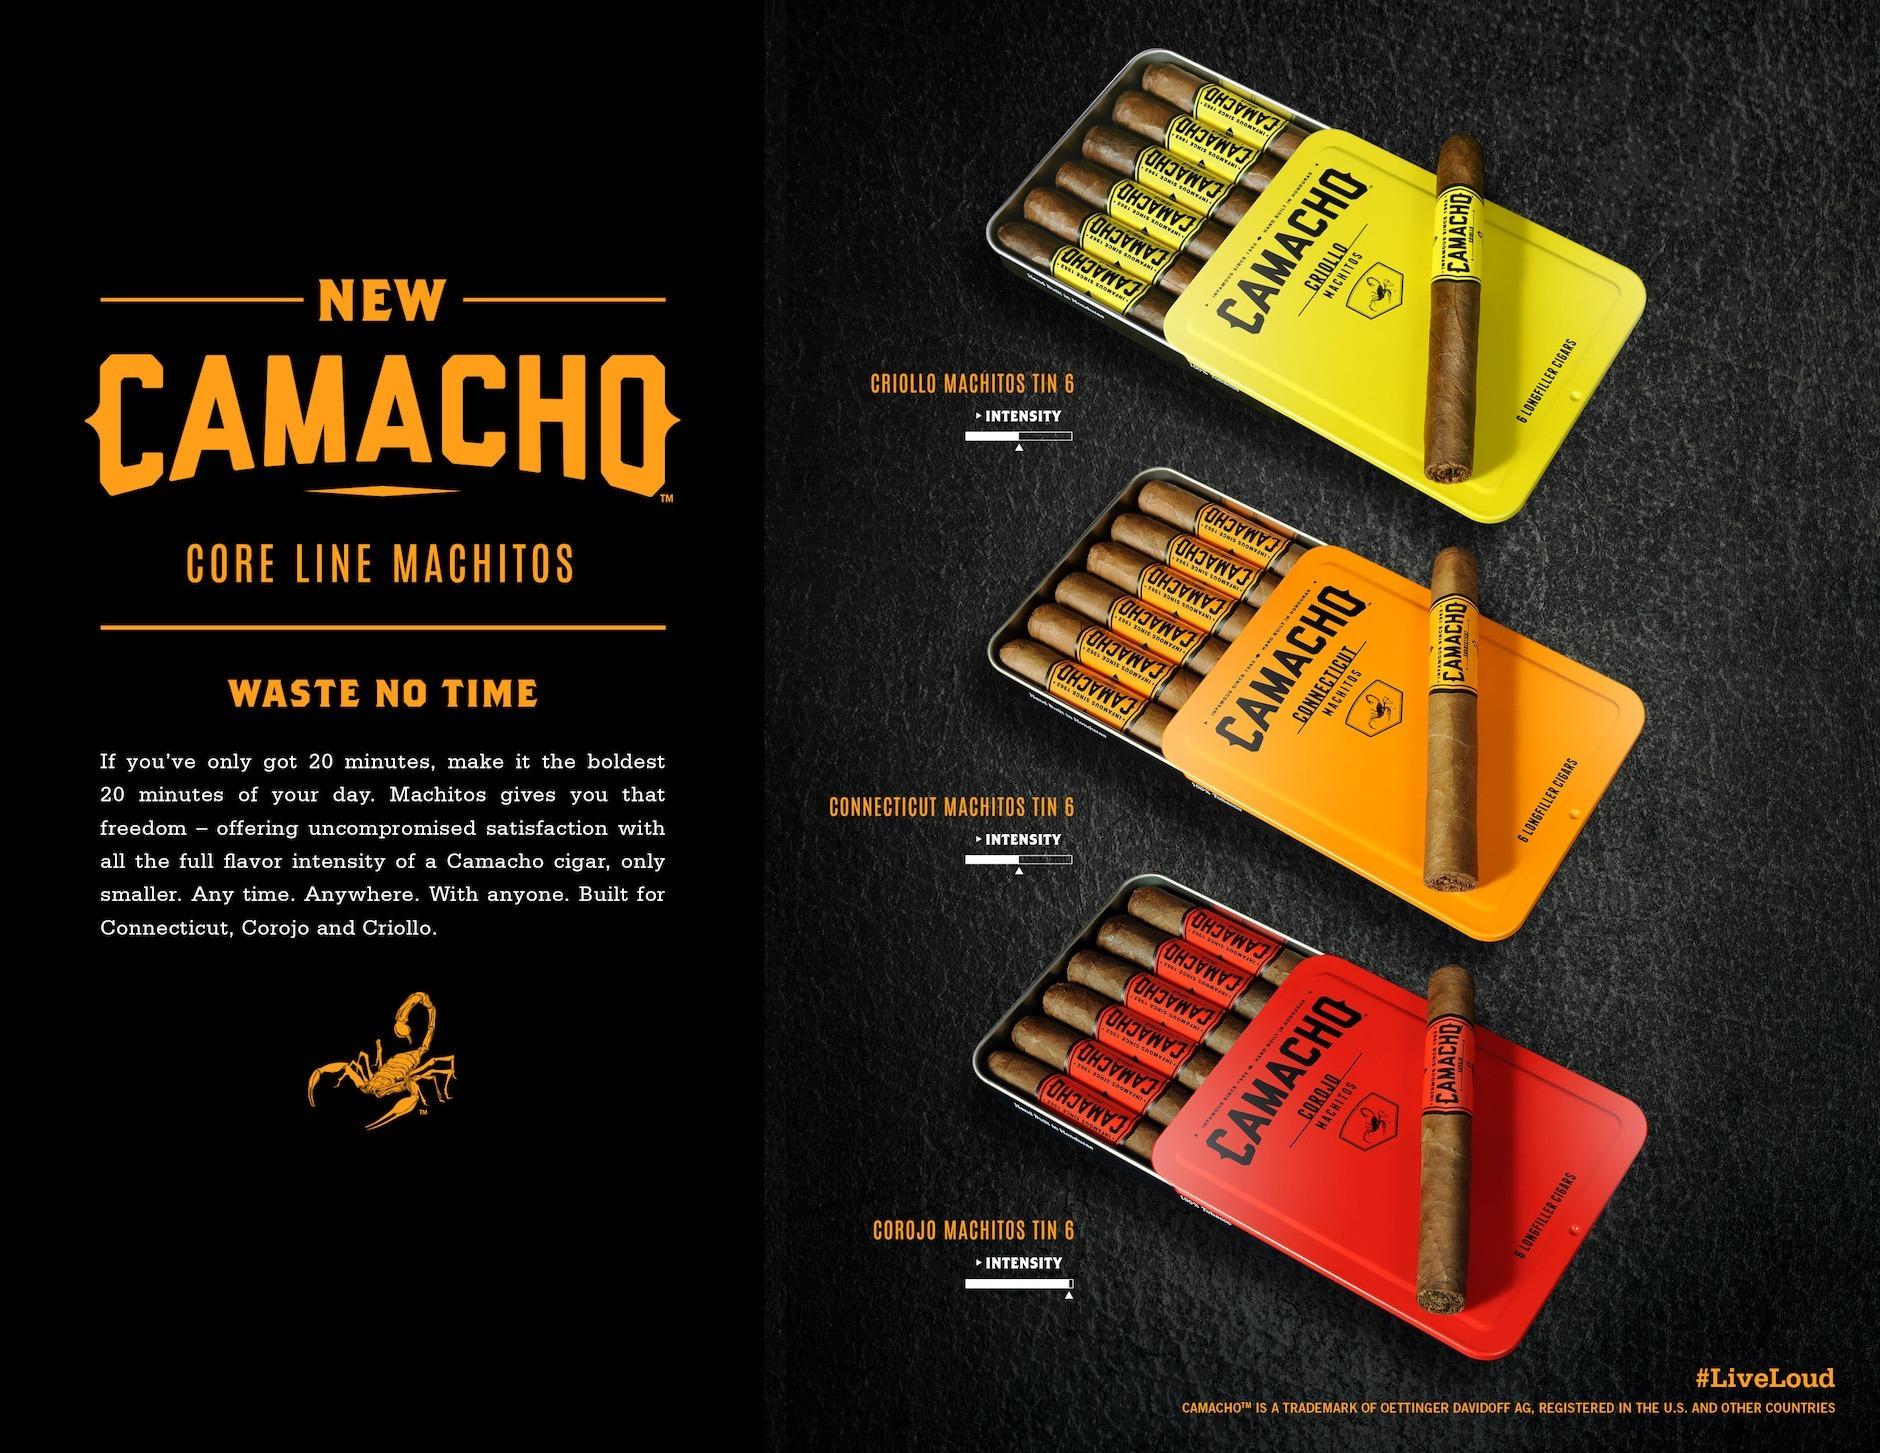 Camacho-Machitos.jpg